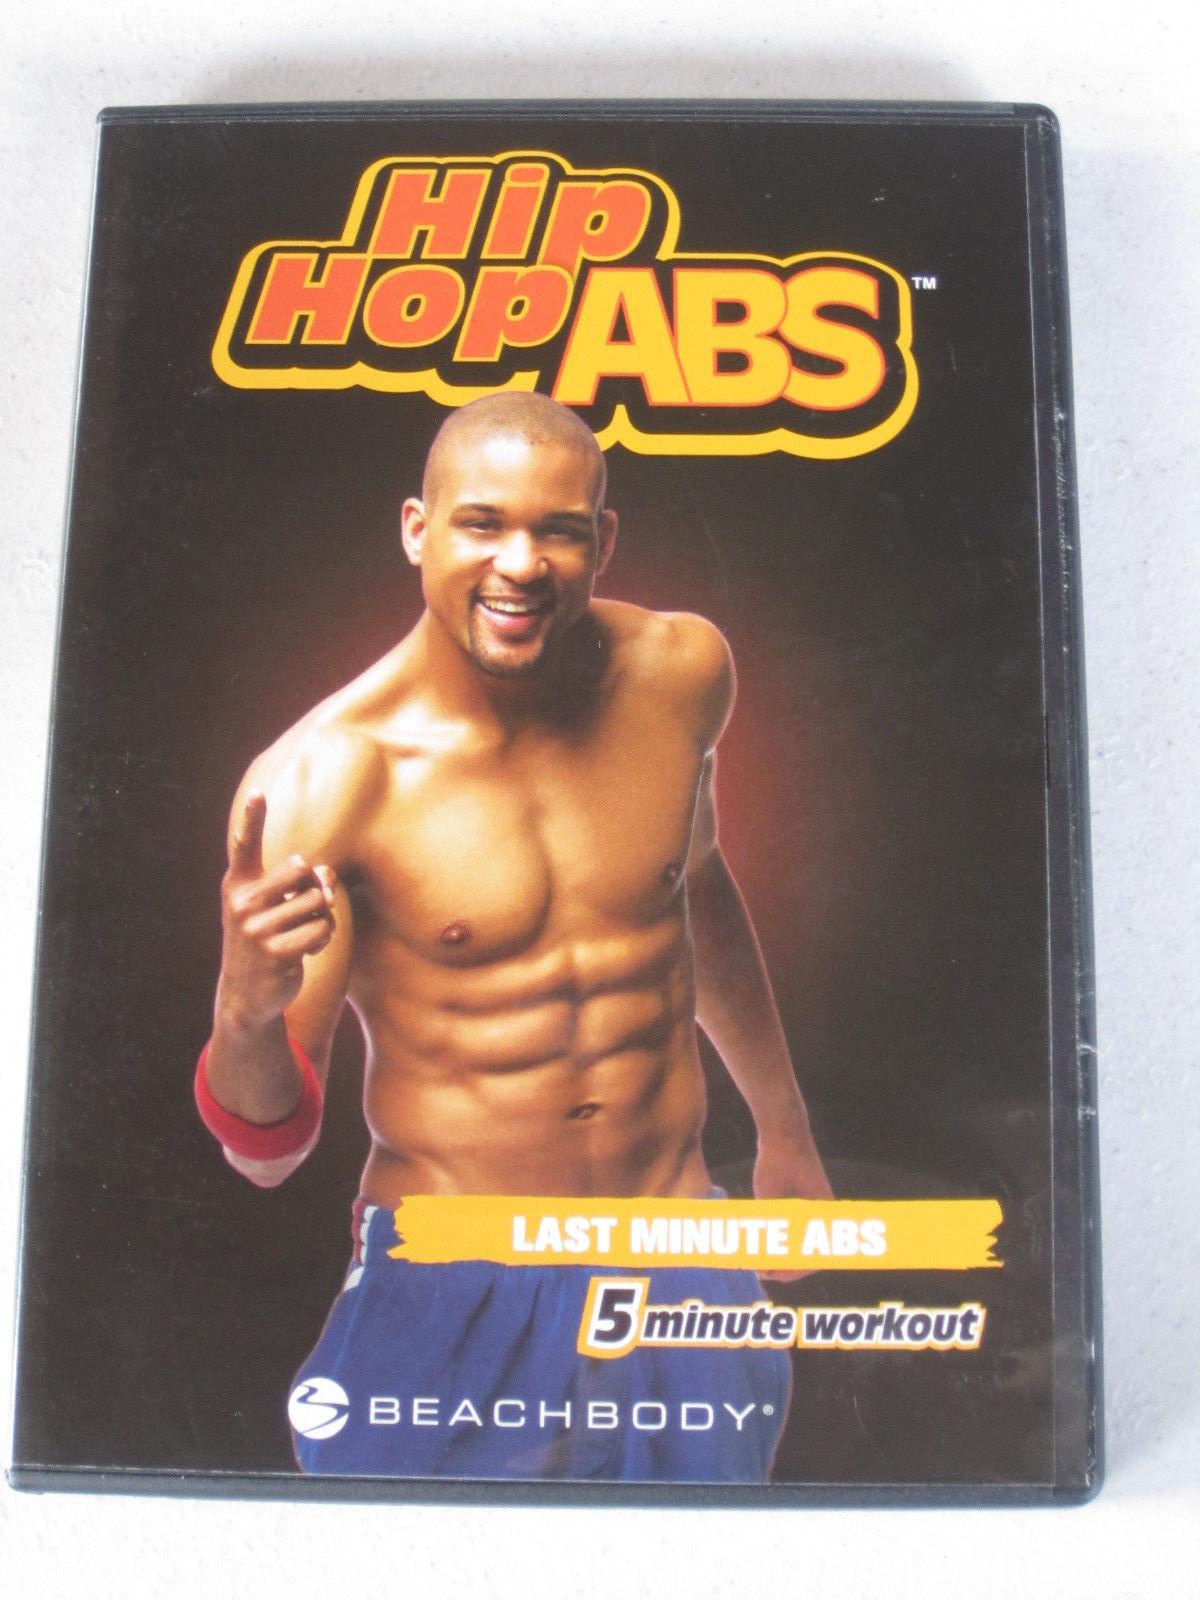 Hip Hop Abs Beachbody DVD Lot (Hips Buns Thighs & Last Minute Abs)